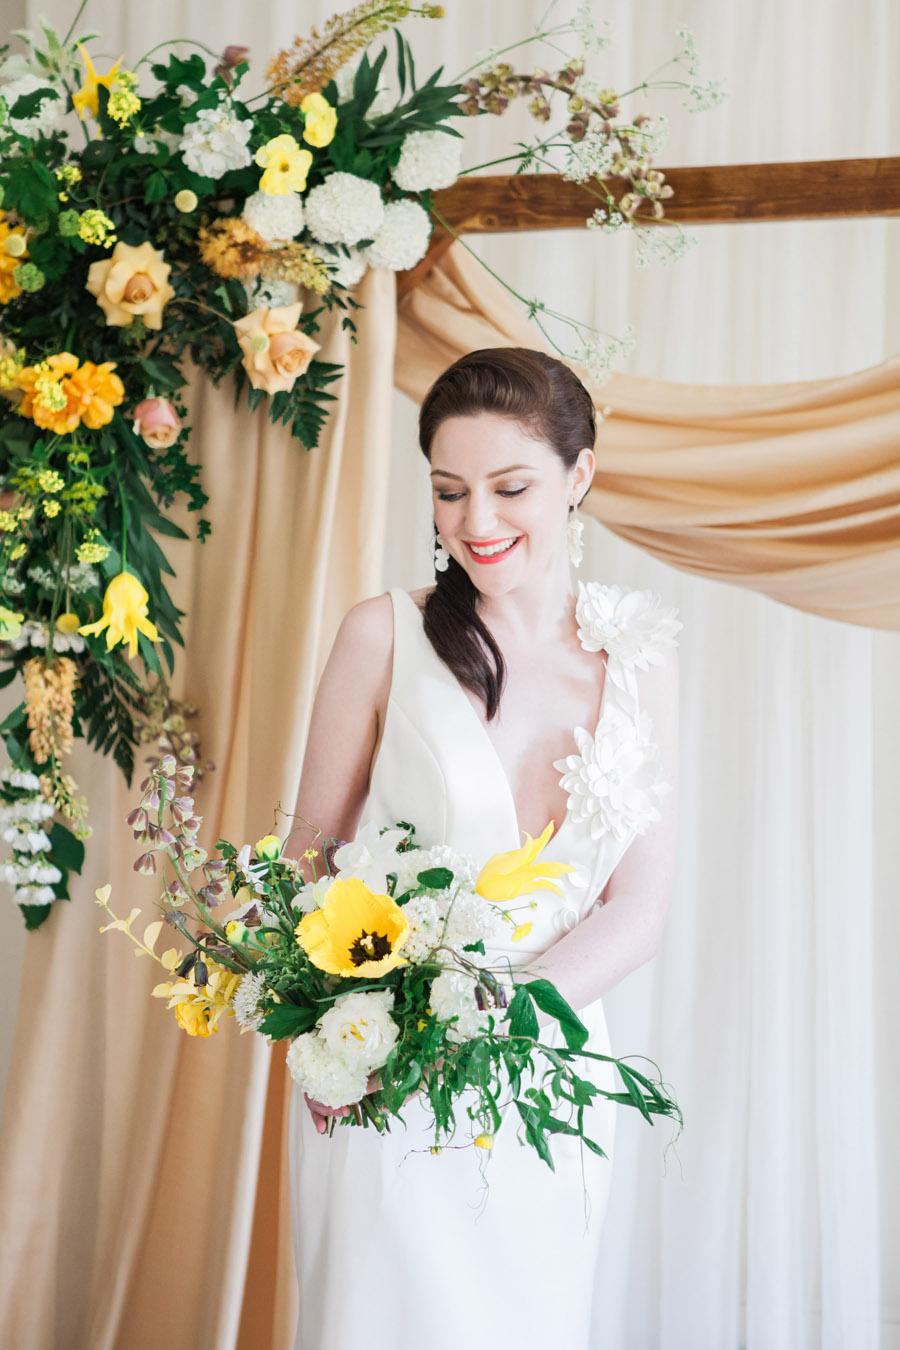 Glorious yellow Bloomologie blooms and styling by Chenai - photo credit Amanda Karen Photography (27)